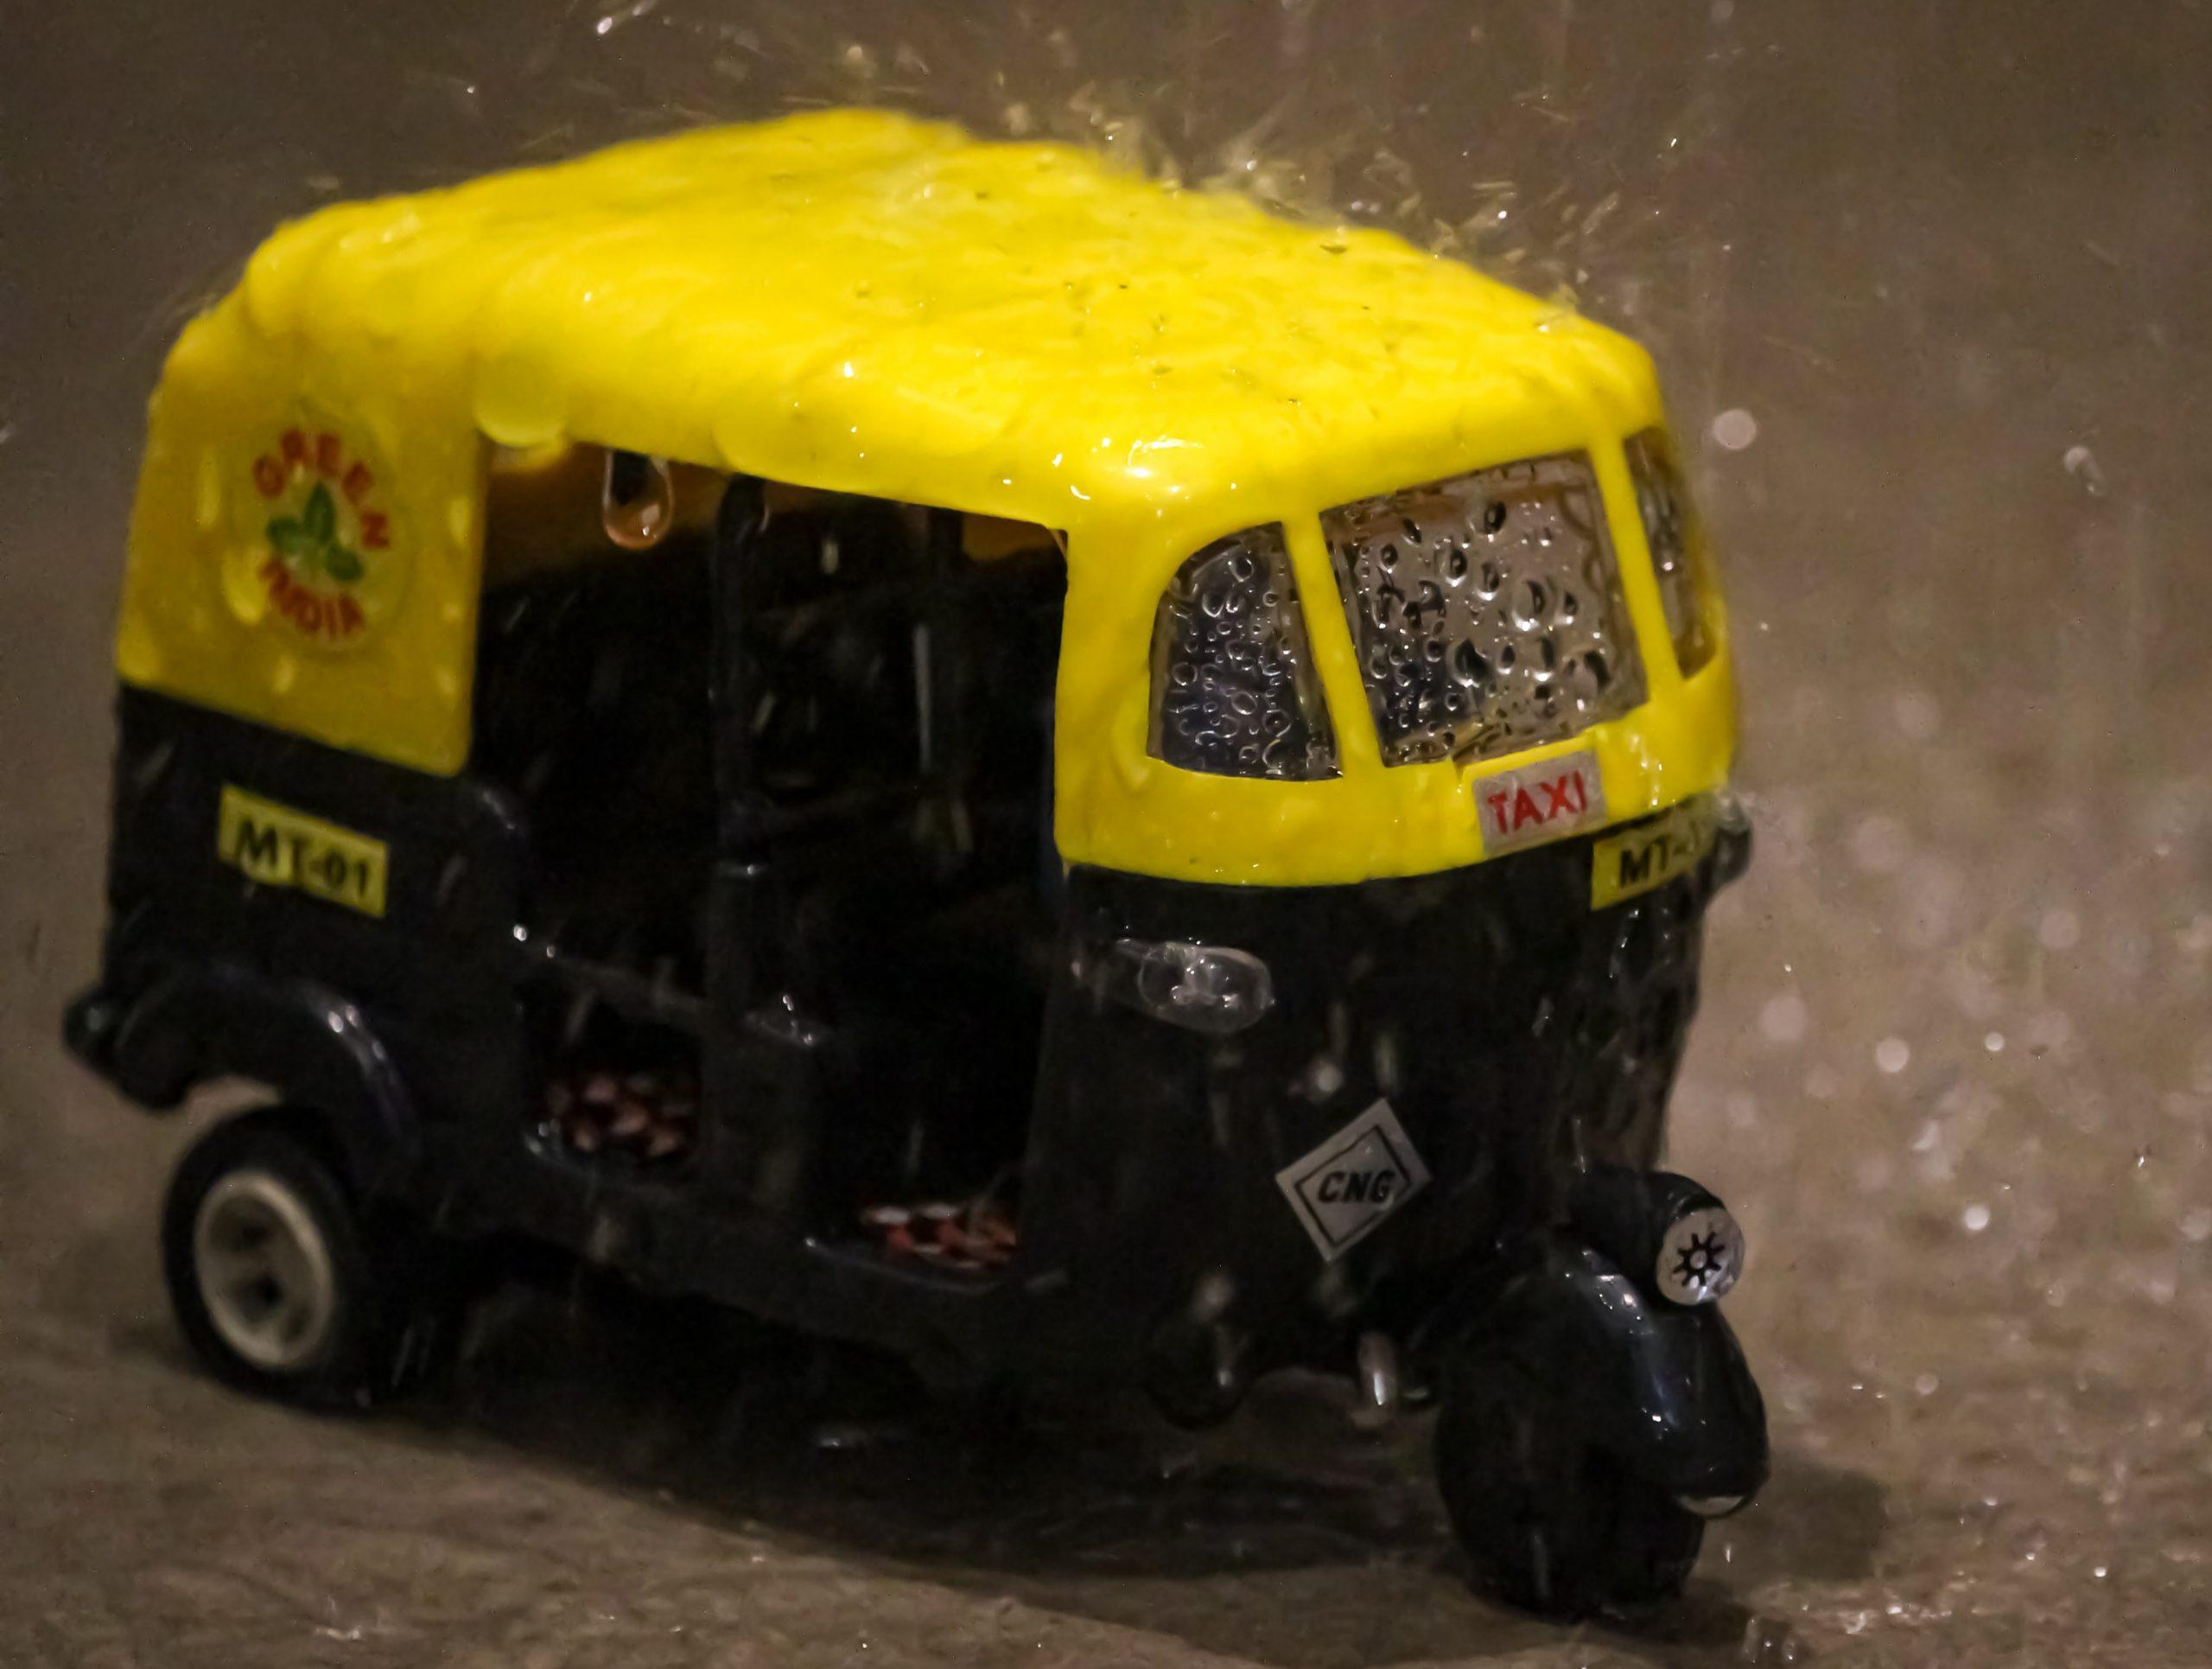 A toy auto